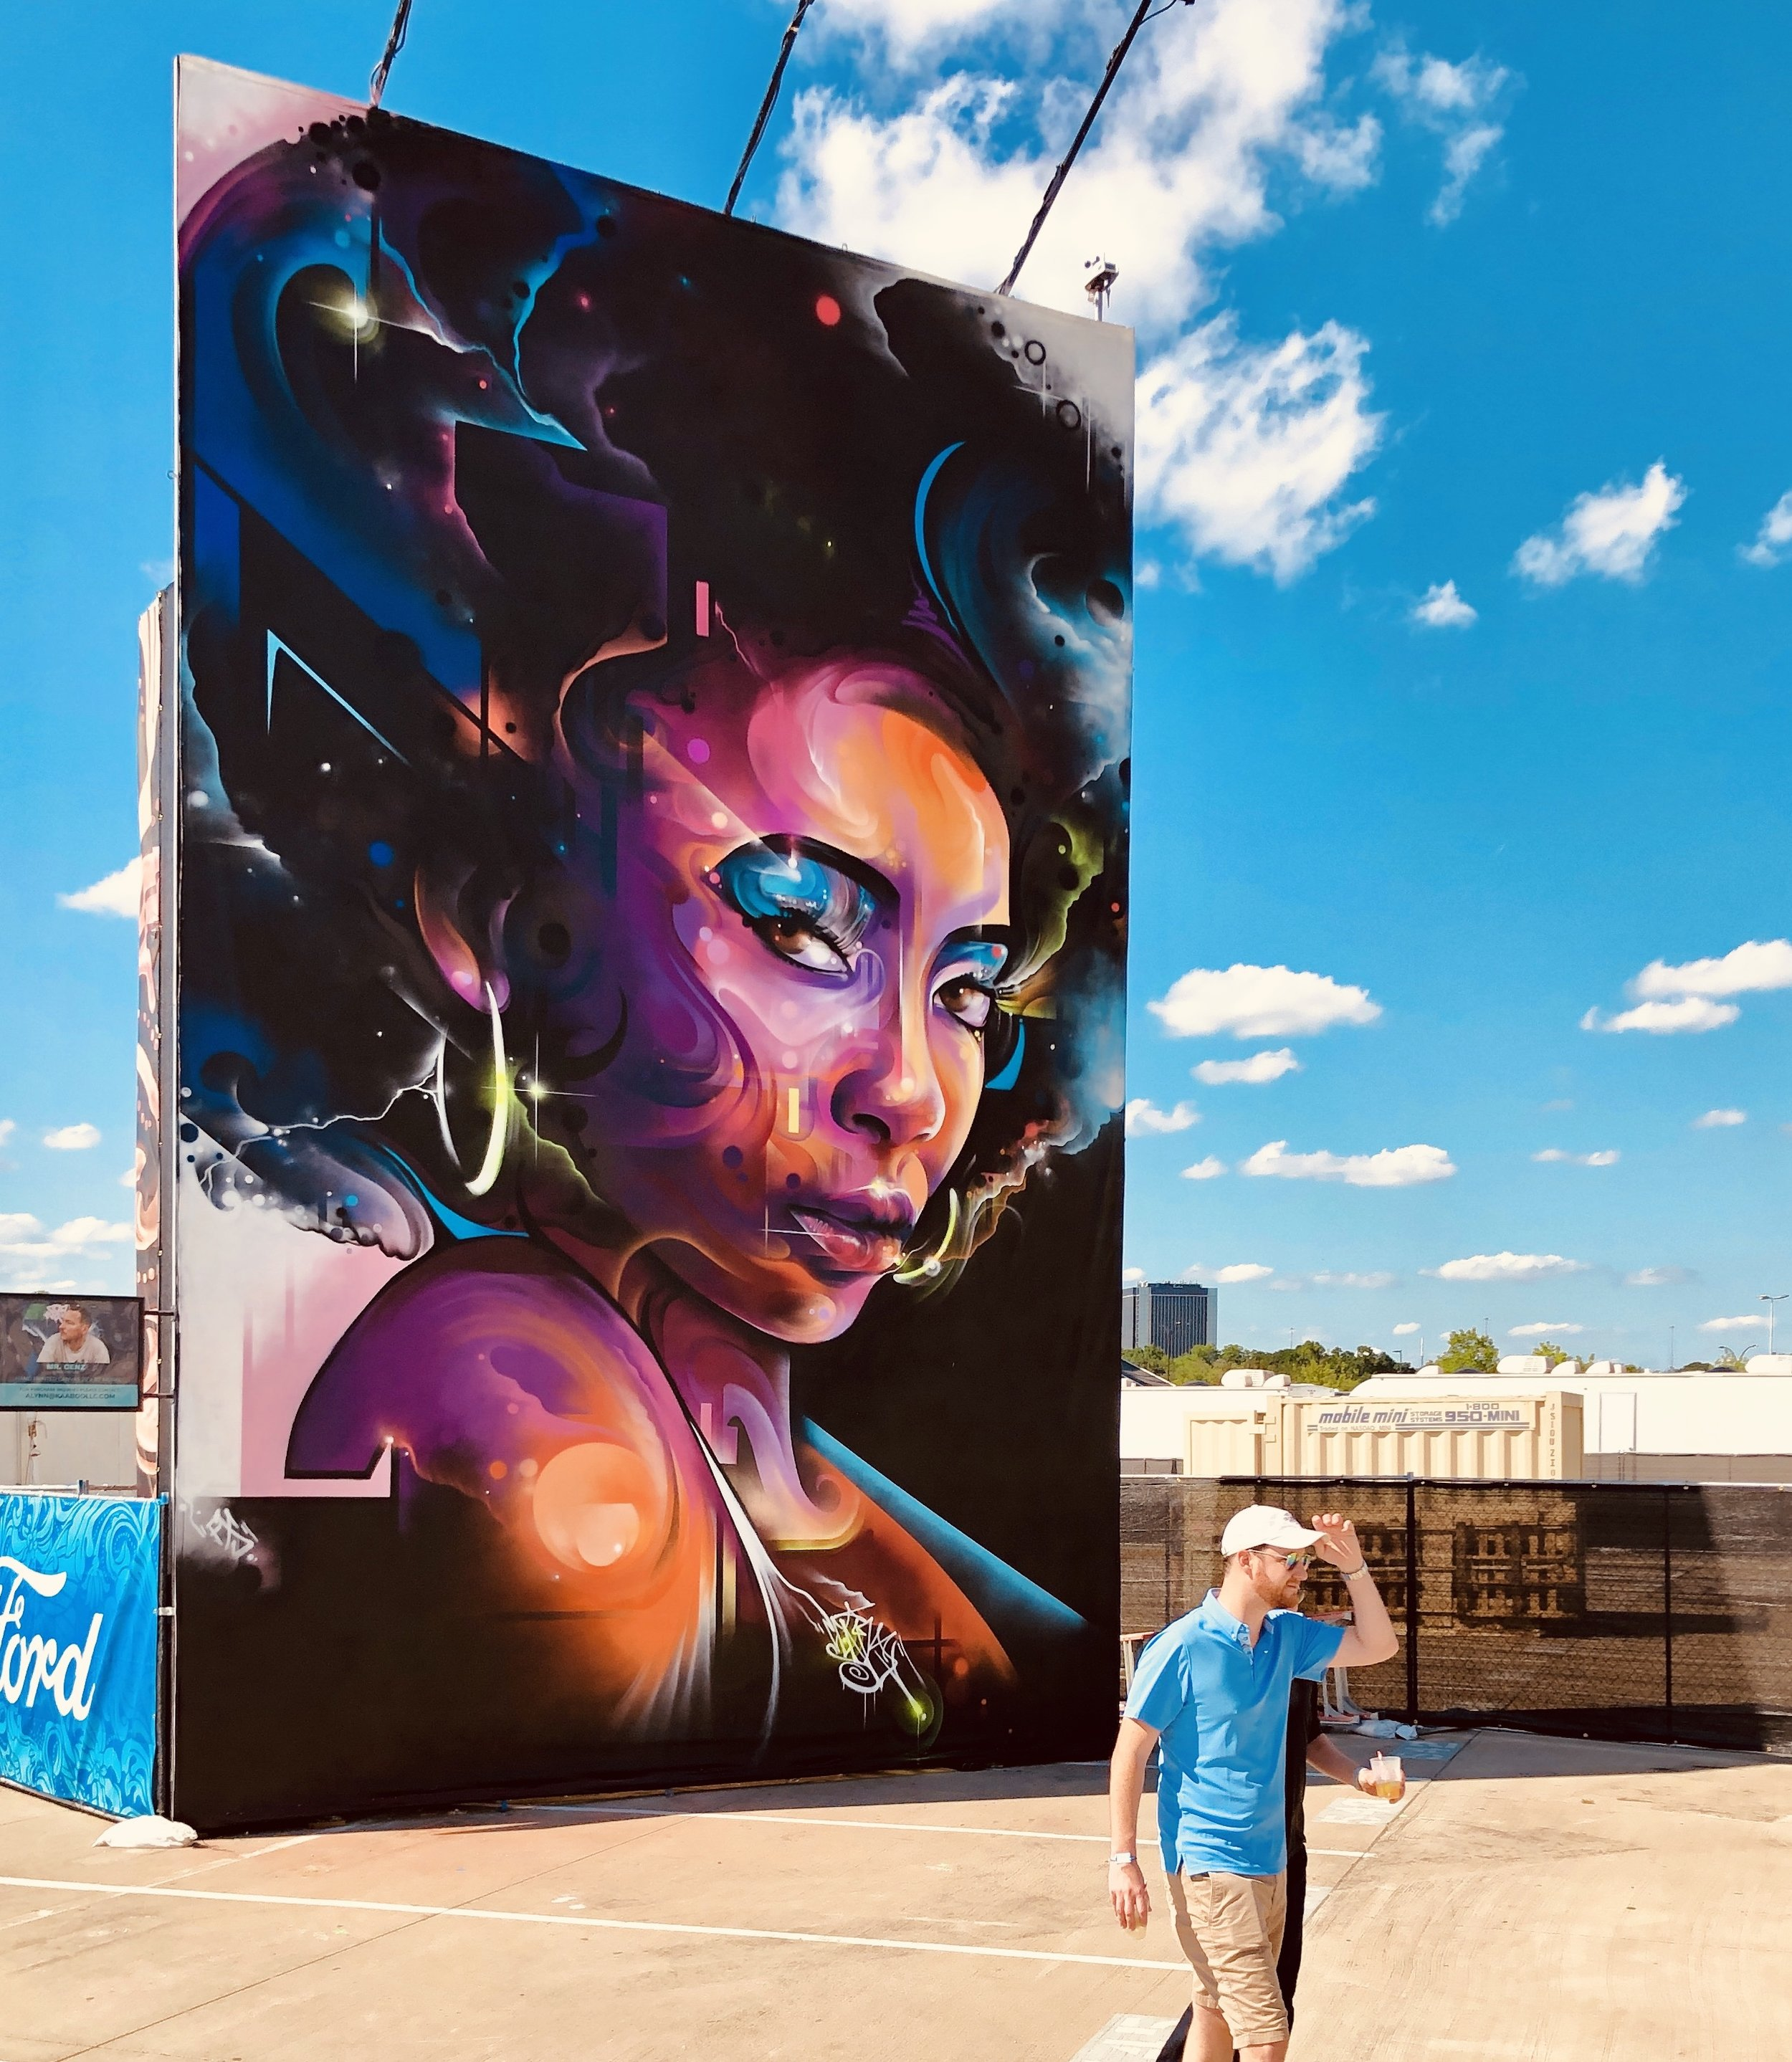 Kaboo Festival, Texas, US, 2019